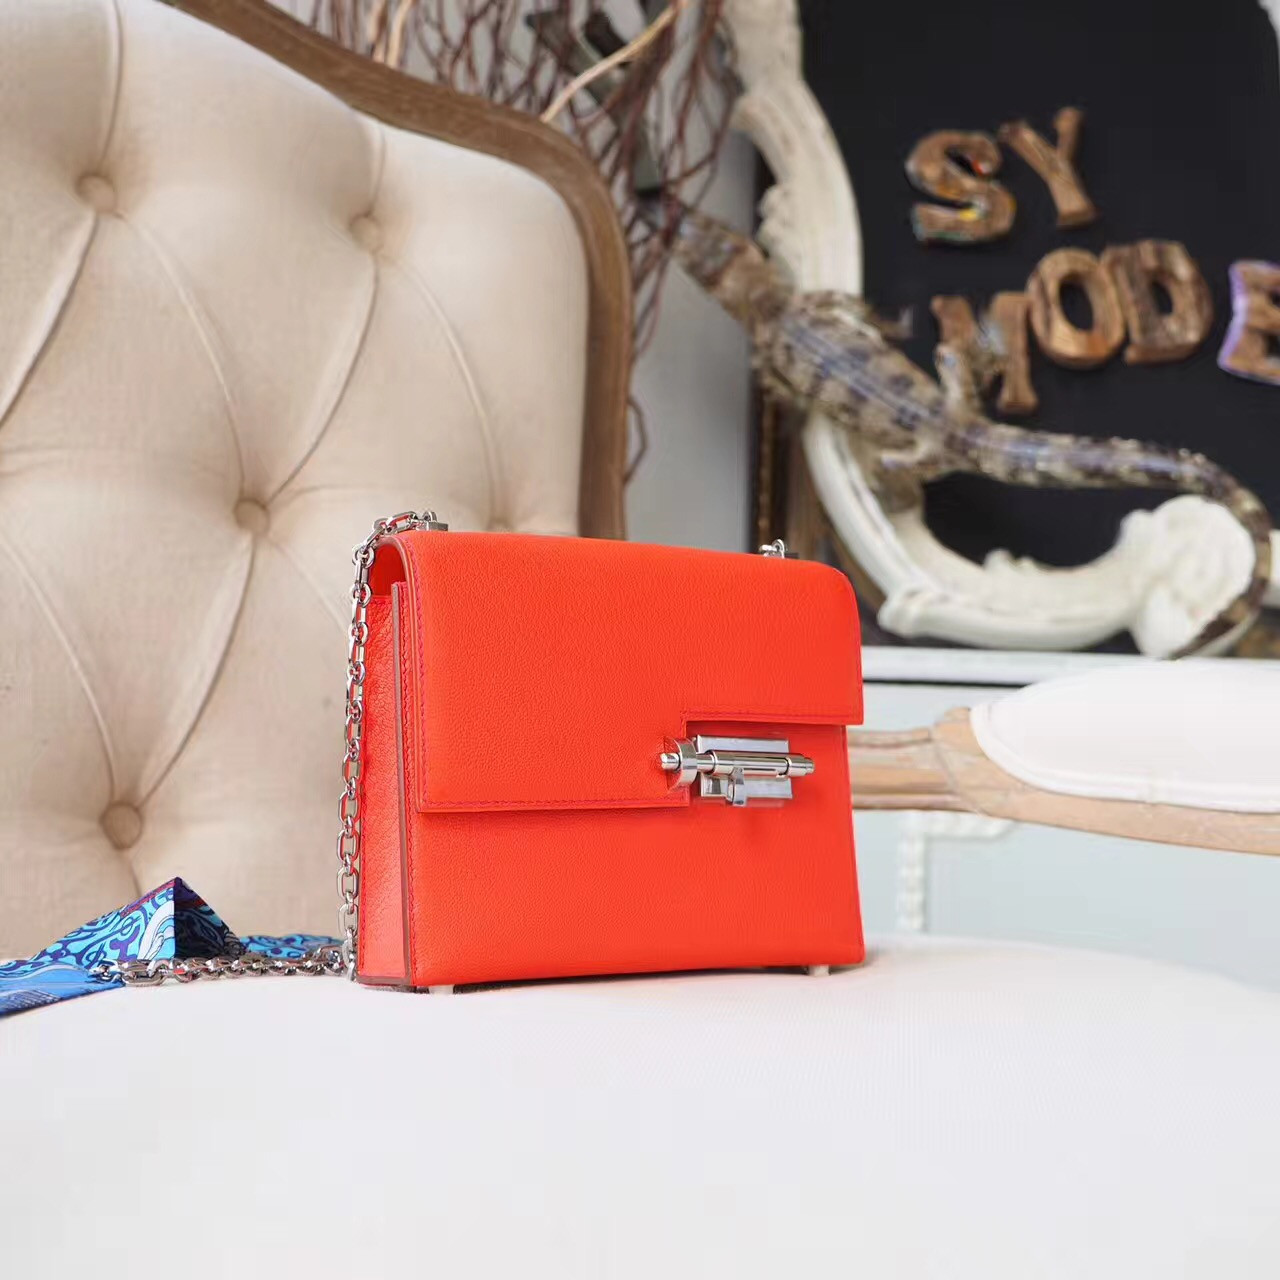 6853925489ae Hermes Verrou 18cm Bag Chevre Mysore Goatskin Leather Palladium Hardware